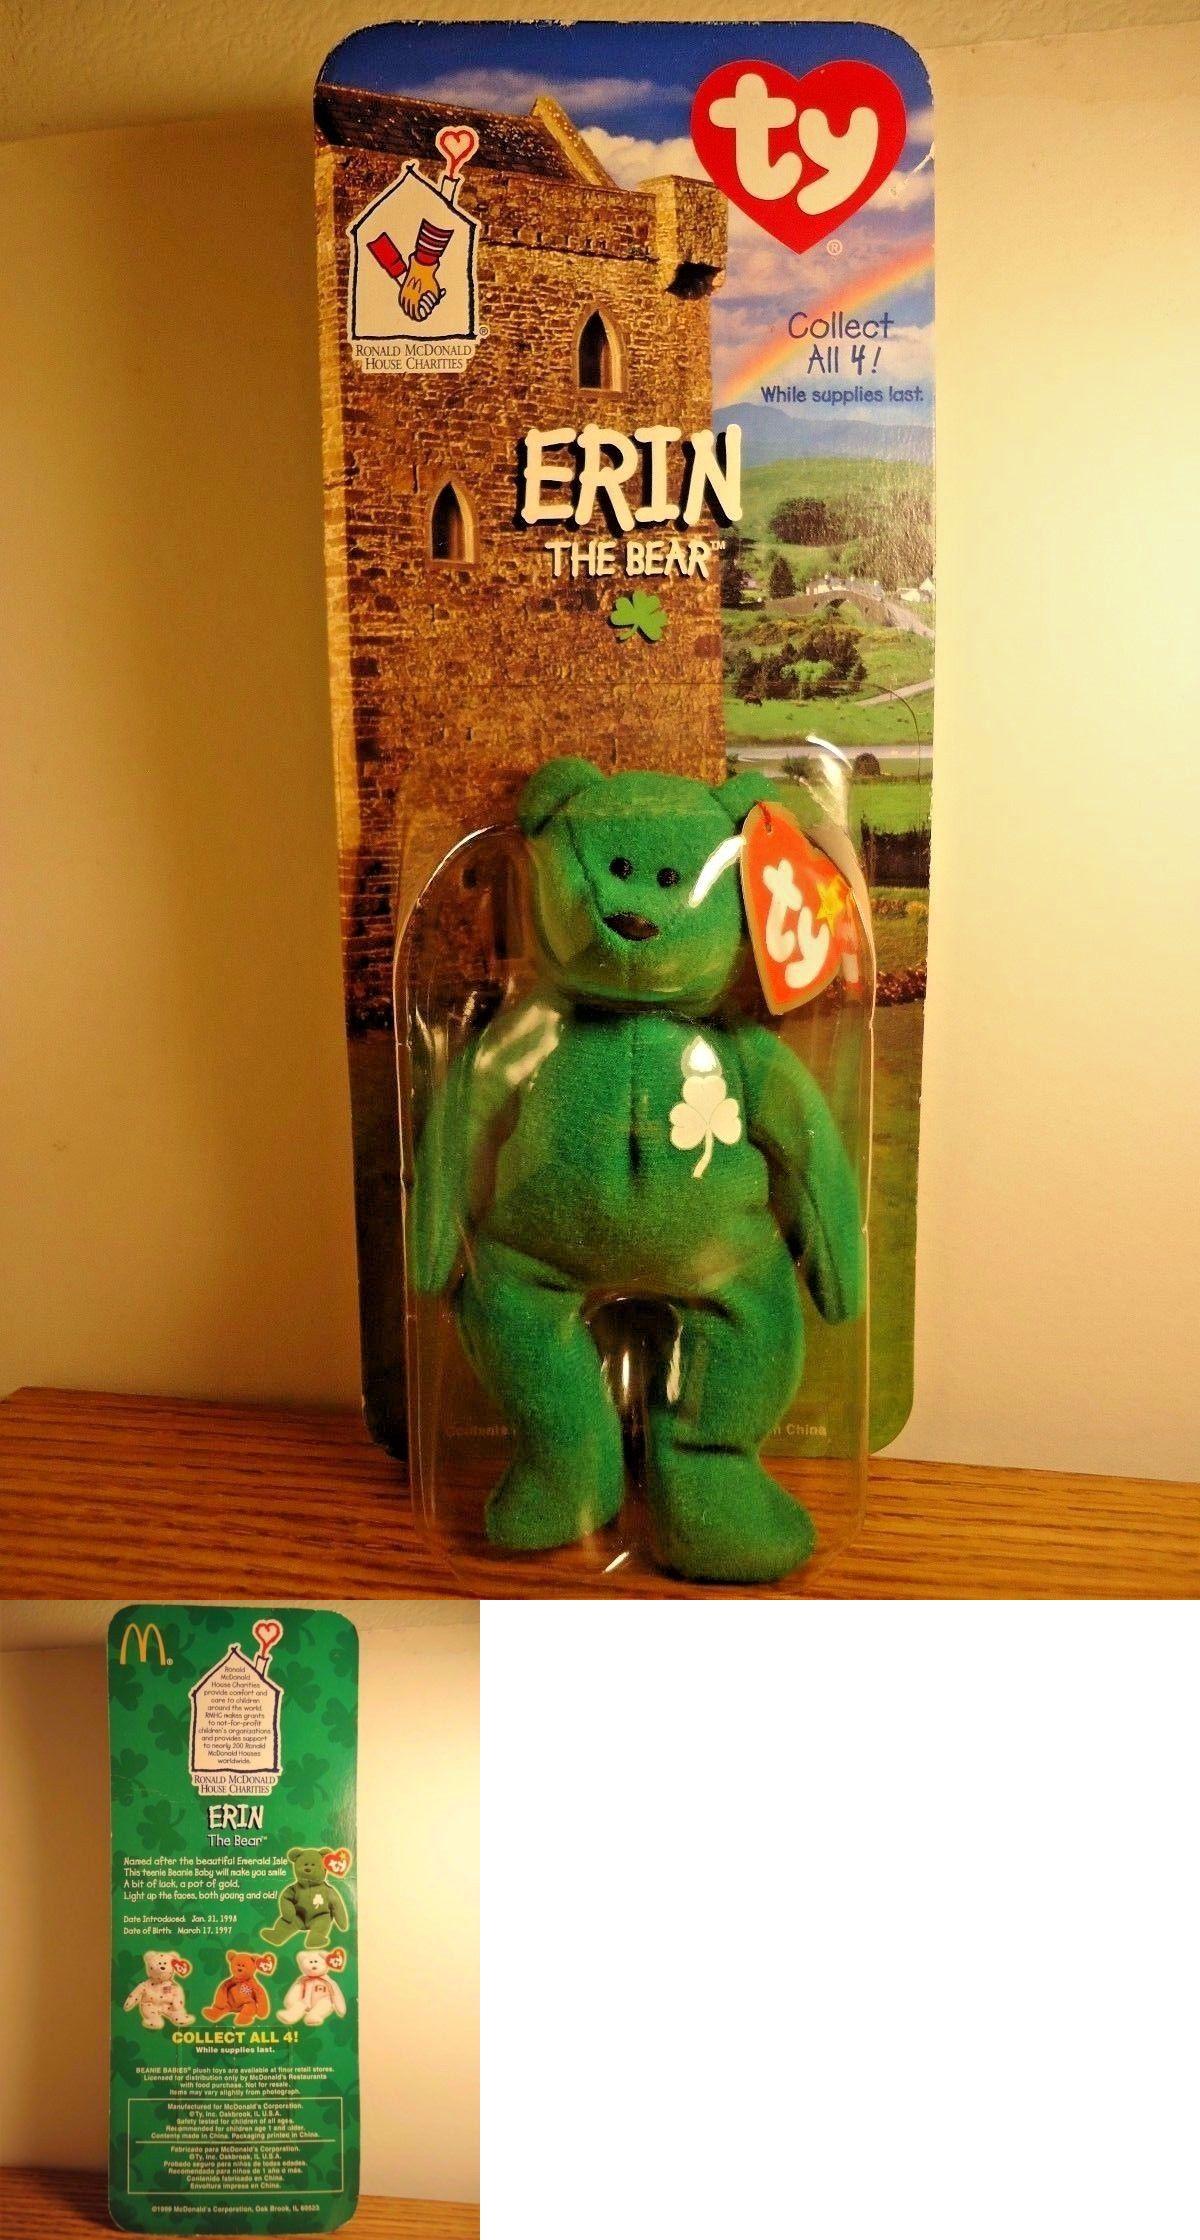 e9d6841b813 Teenie Beanies 441  Vintage~Ty Erin The Bear~ Teenie Beanie~~Retired  Mcdonald S~Rare Error~Nip -  BUY IT NOW ONLY   15.95 on  eBay  teenie   beanies   ...